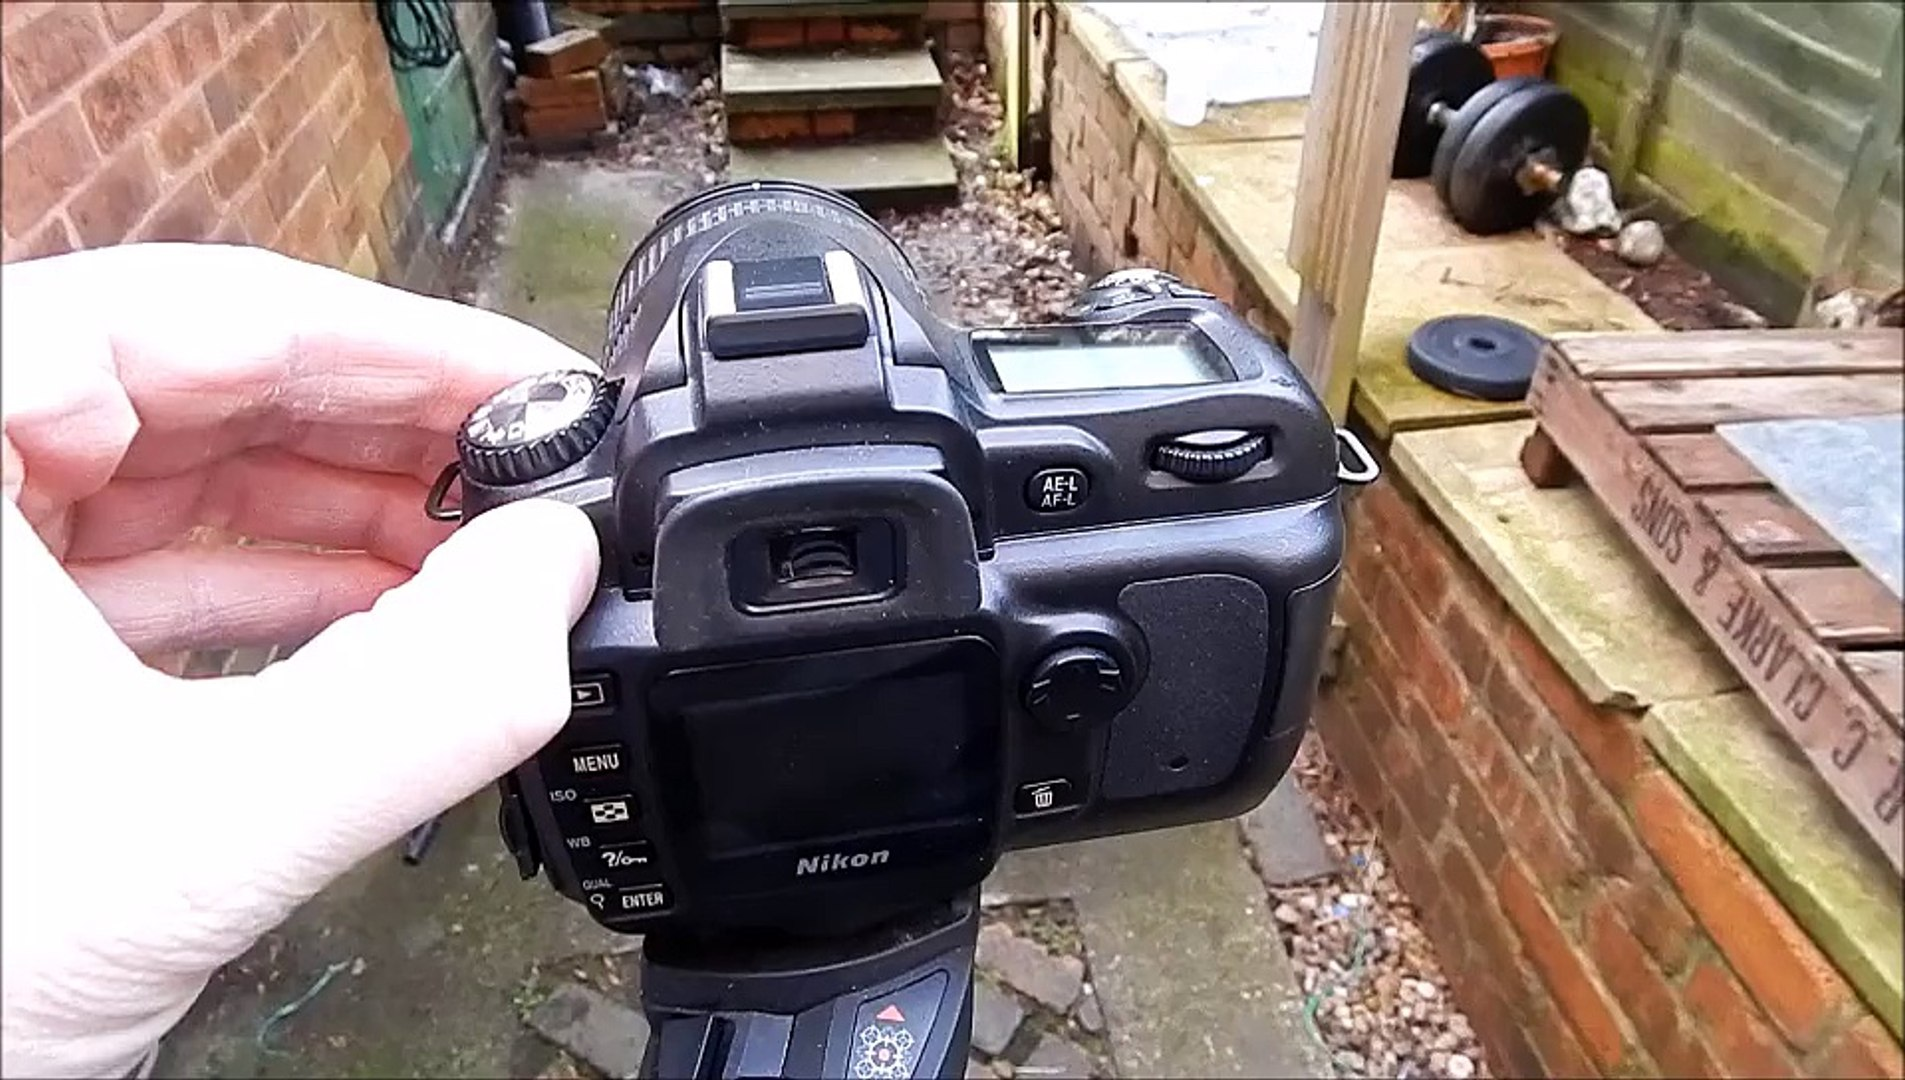 Nikon D50 shutter speed sound continuous burst mode